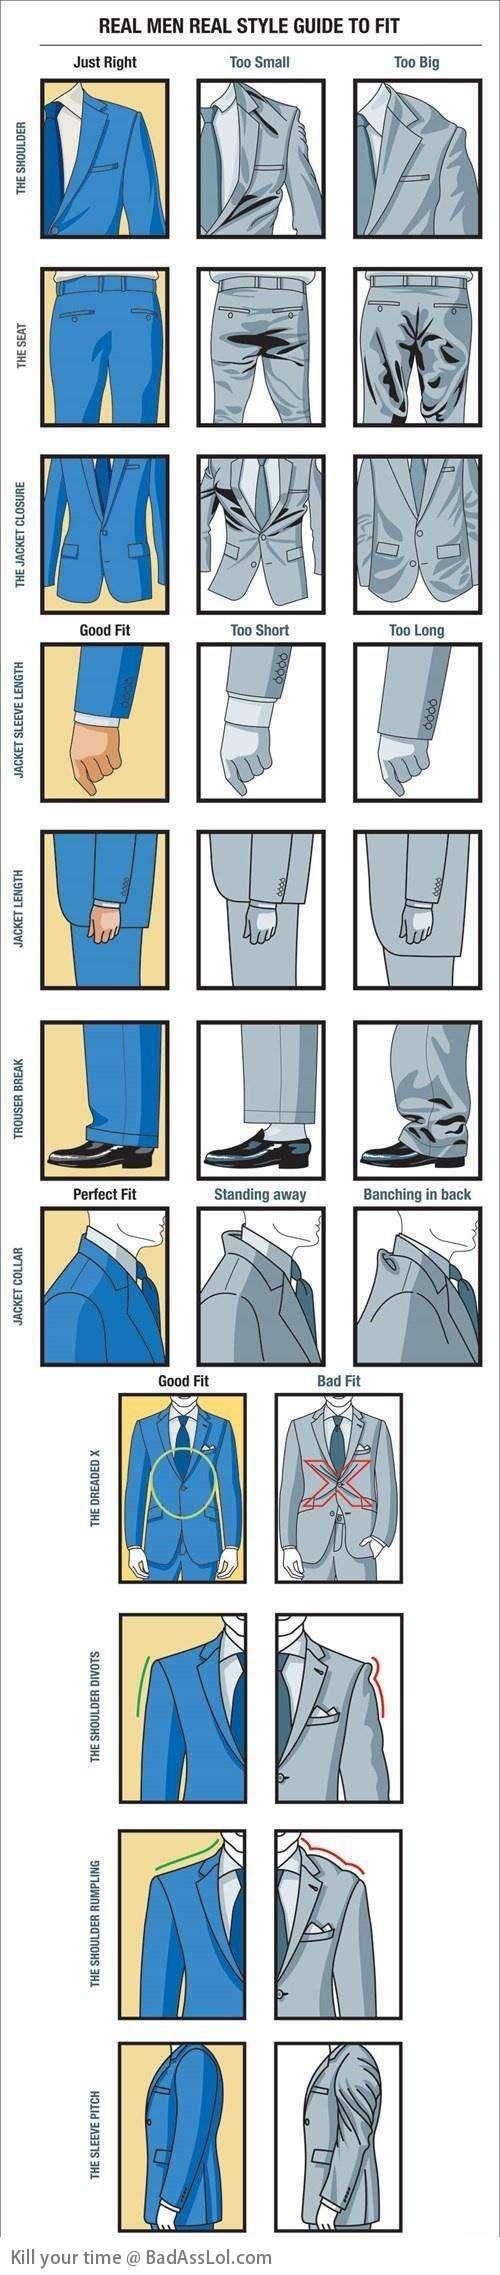 Best 20 Suit and Tie ideas on Pinterest | Tuxedo wedding, Black ...